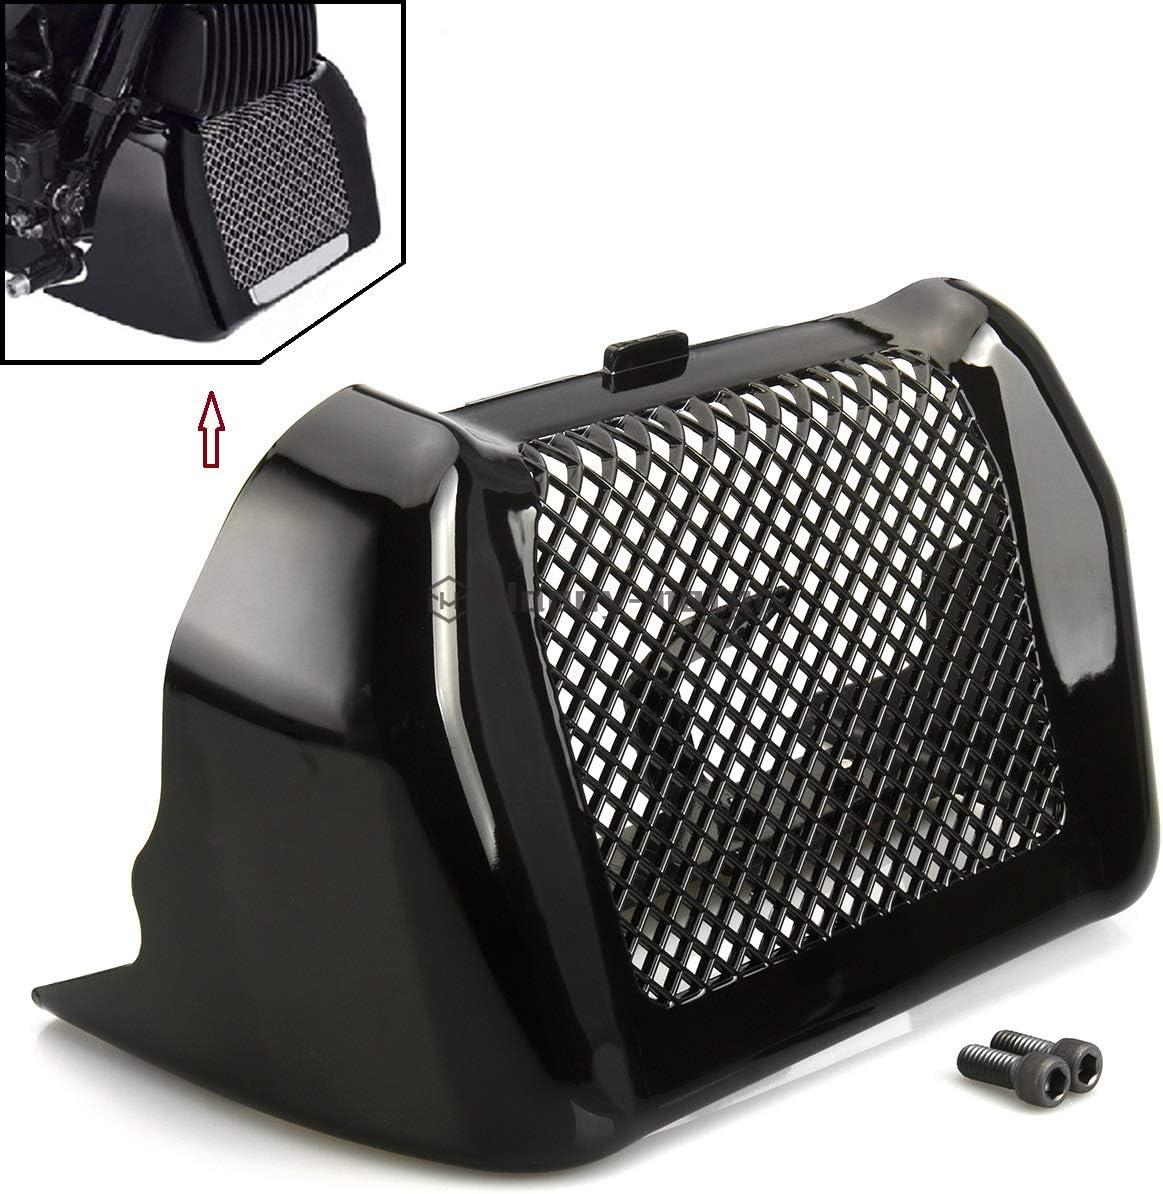 Black Oil Cooler Cover Case Radiator Guard Fit for harley Touring Street Glide FLHX Special FLHXS Road Glide FLTRX 2017-2018